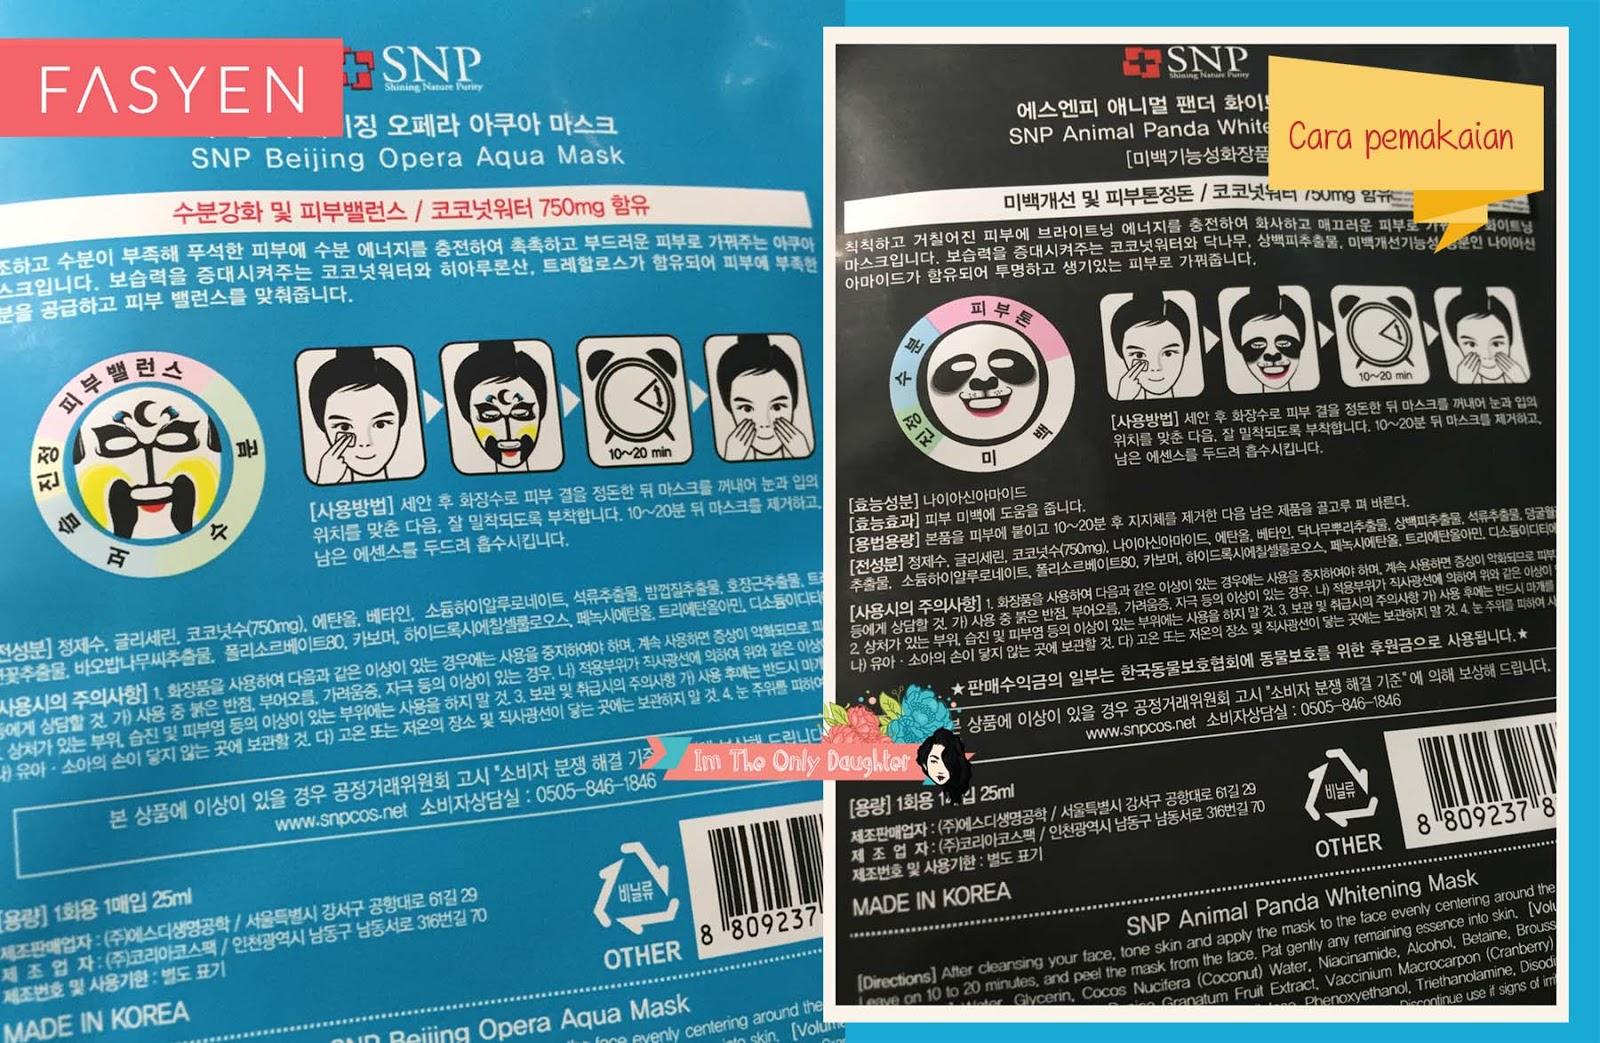 Fasyen Snp Animal Panda Whitening Mask Beijing Opera Aqua Masker Face Moisture To Reinforce Retention Of Dry And Water Insufficent Skin With Energy Creating Moist Silky